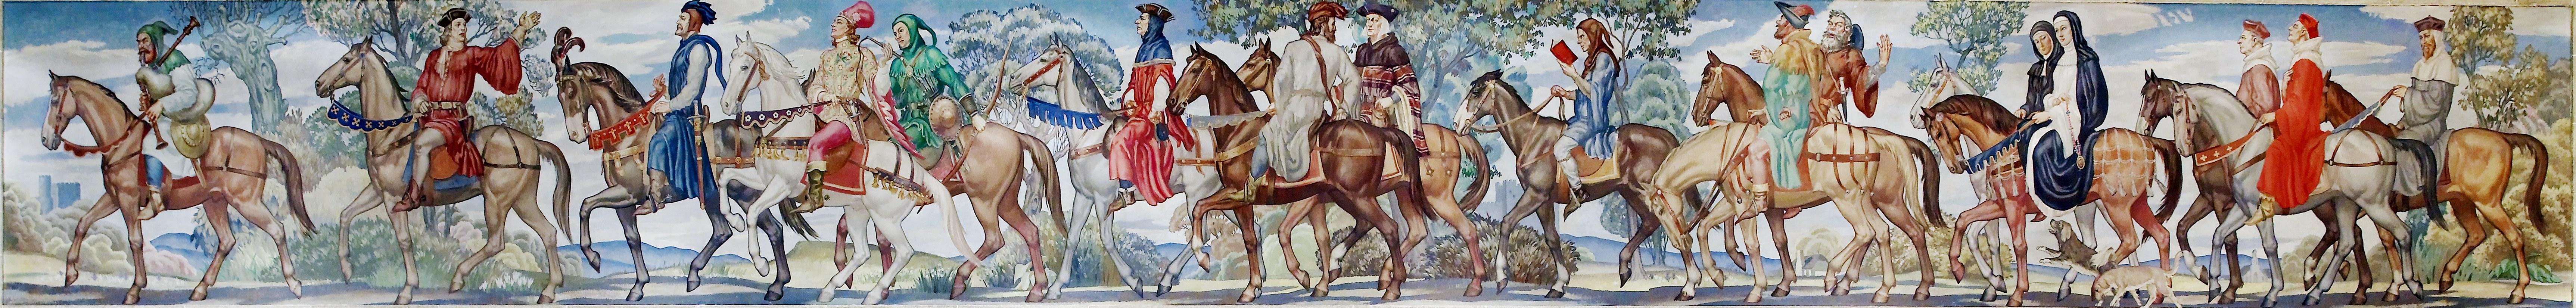 canterbury myths chaucer